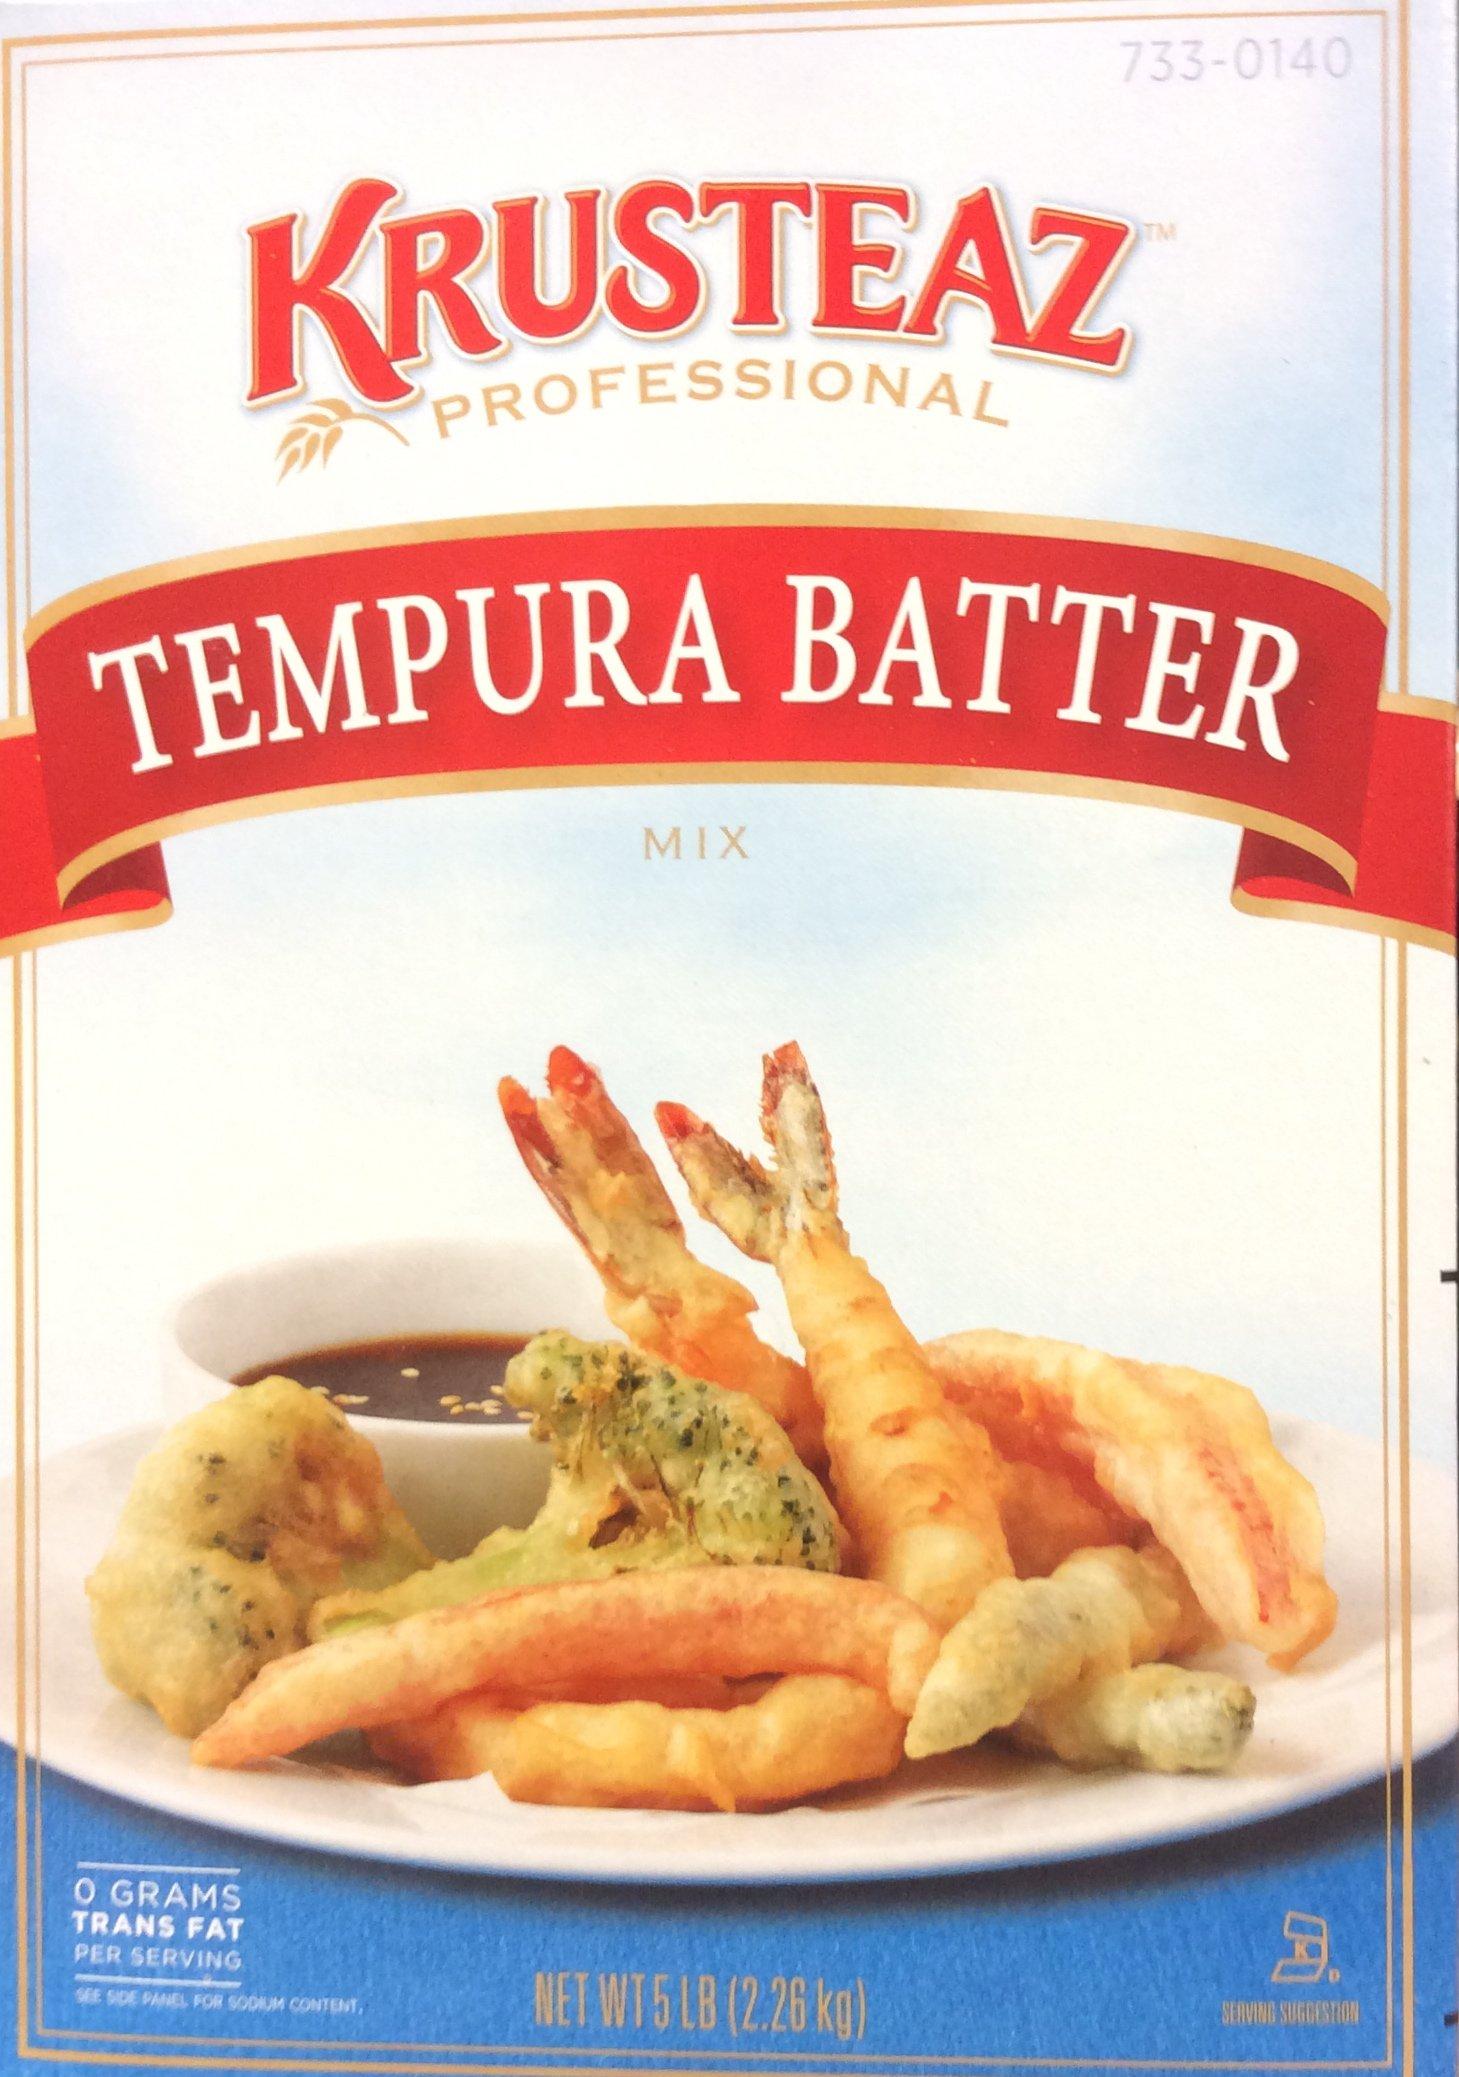 5 Pound Krusteaz Tempura Batter Mix Just Add Water No MSG Added Zero Grams Trans Fat Restaurant Quality